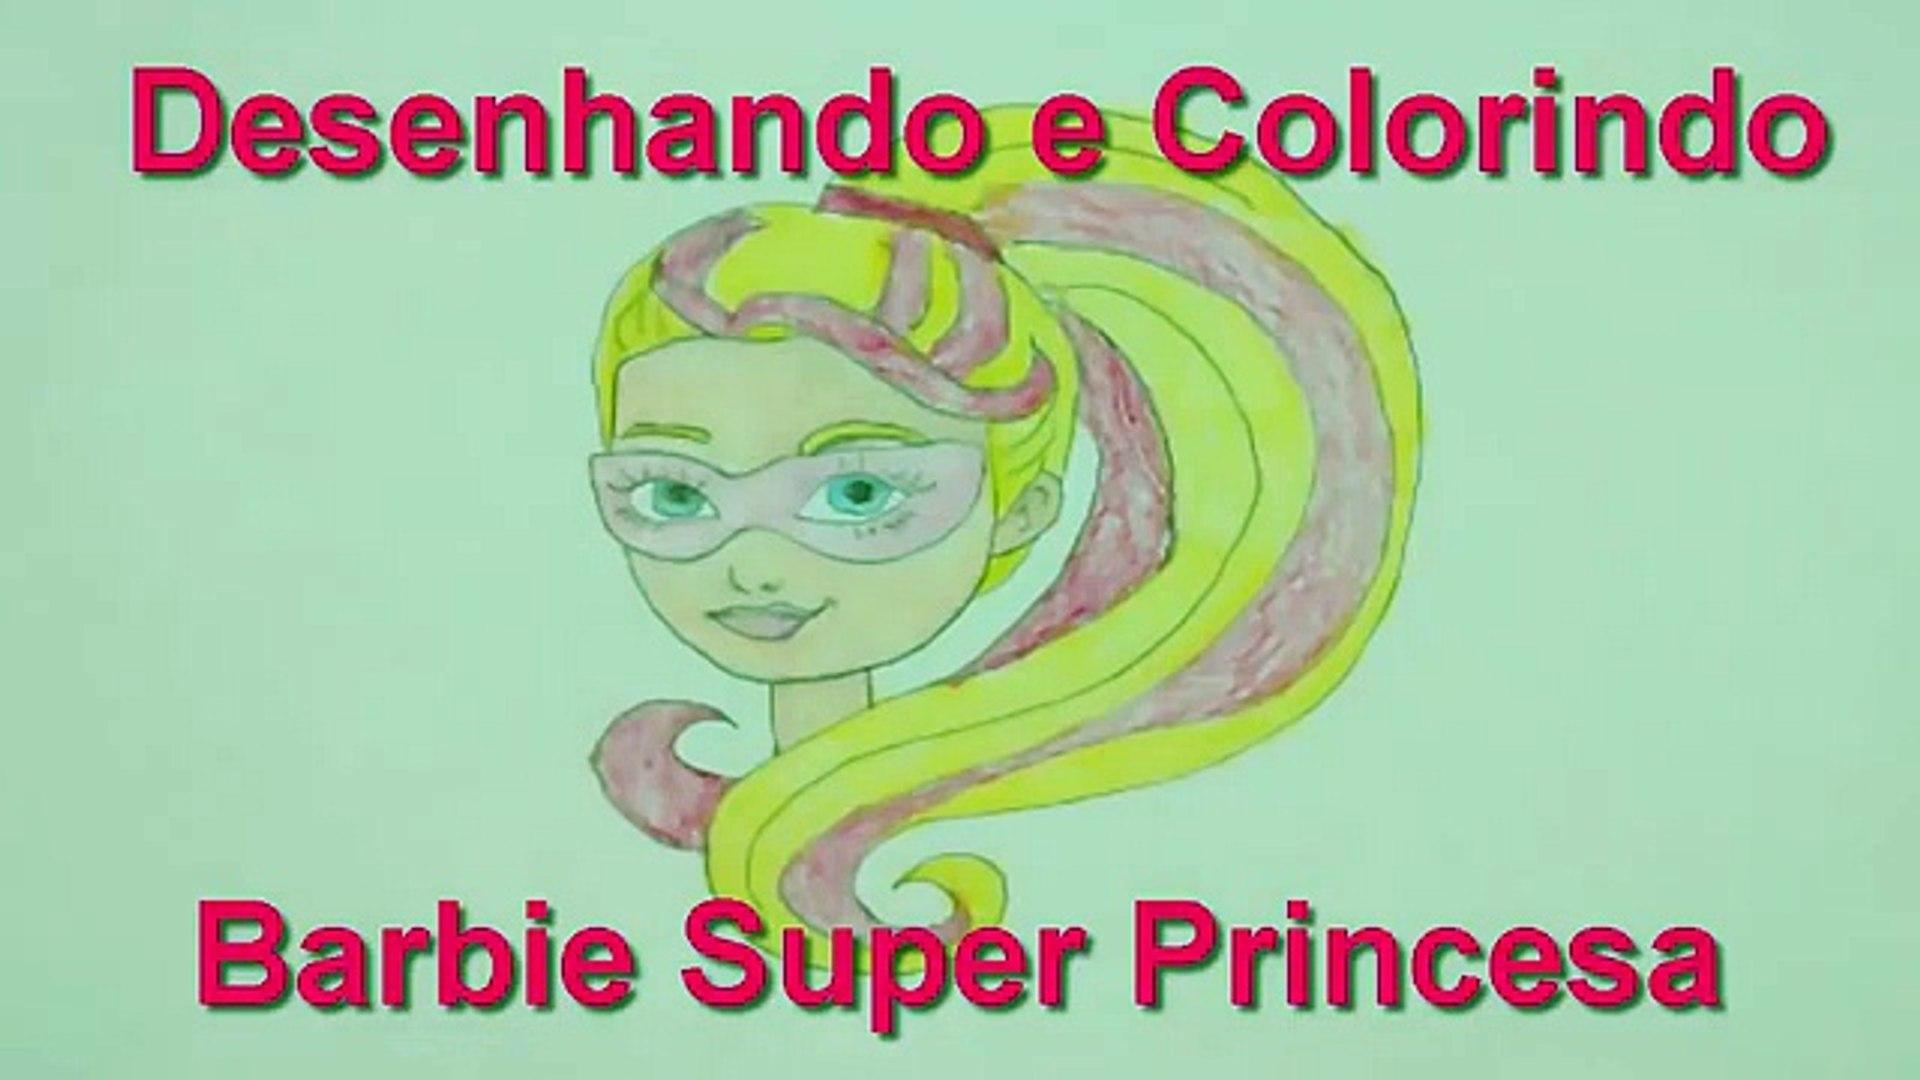 Desenho De Barbie Super Princesa 2016 Portugues Brasil Barbie